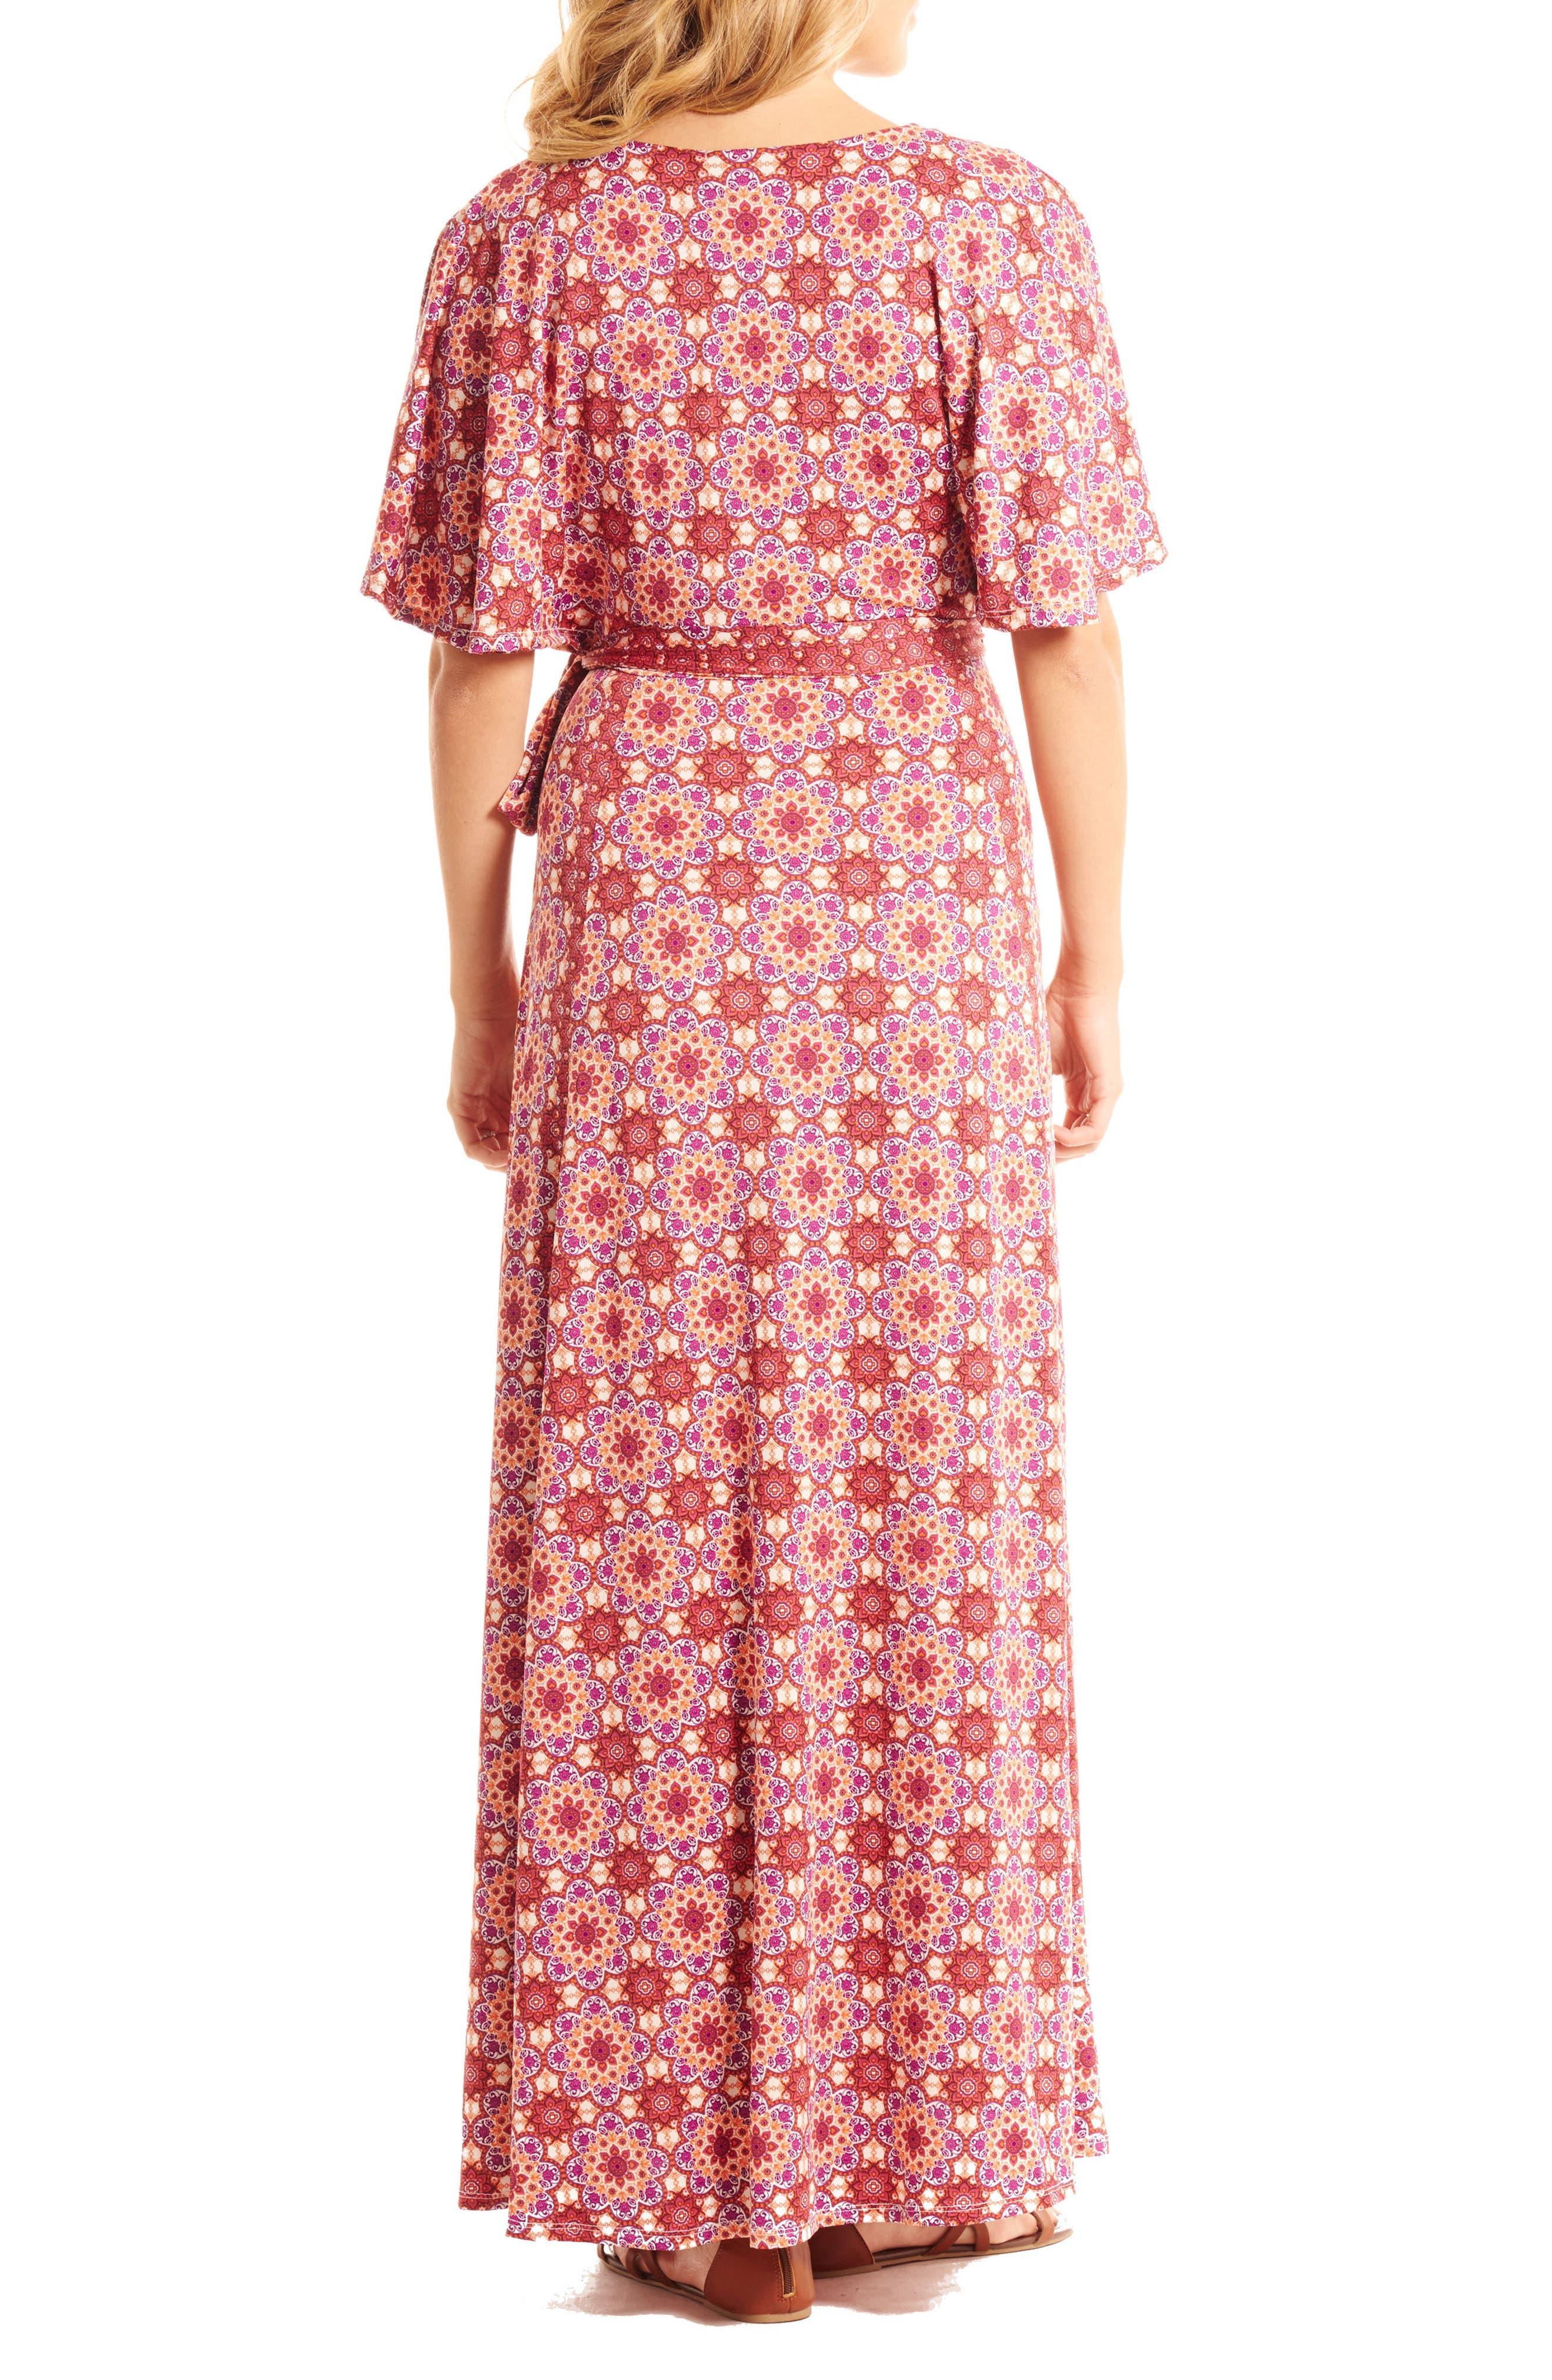 Asa Maternity/Nursing Maxi Wrap Dress,                             Alternate thumbnail 2, color,                             Sangria